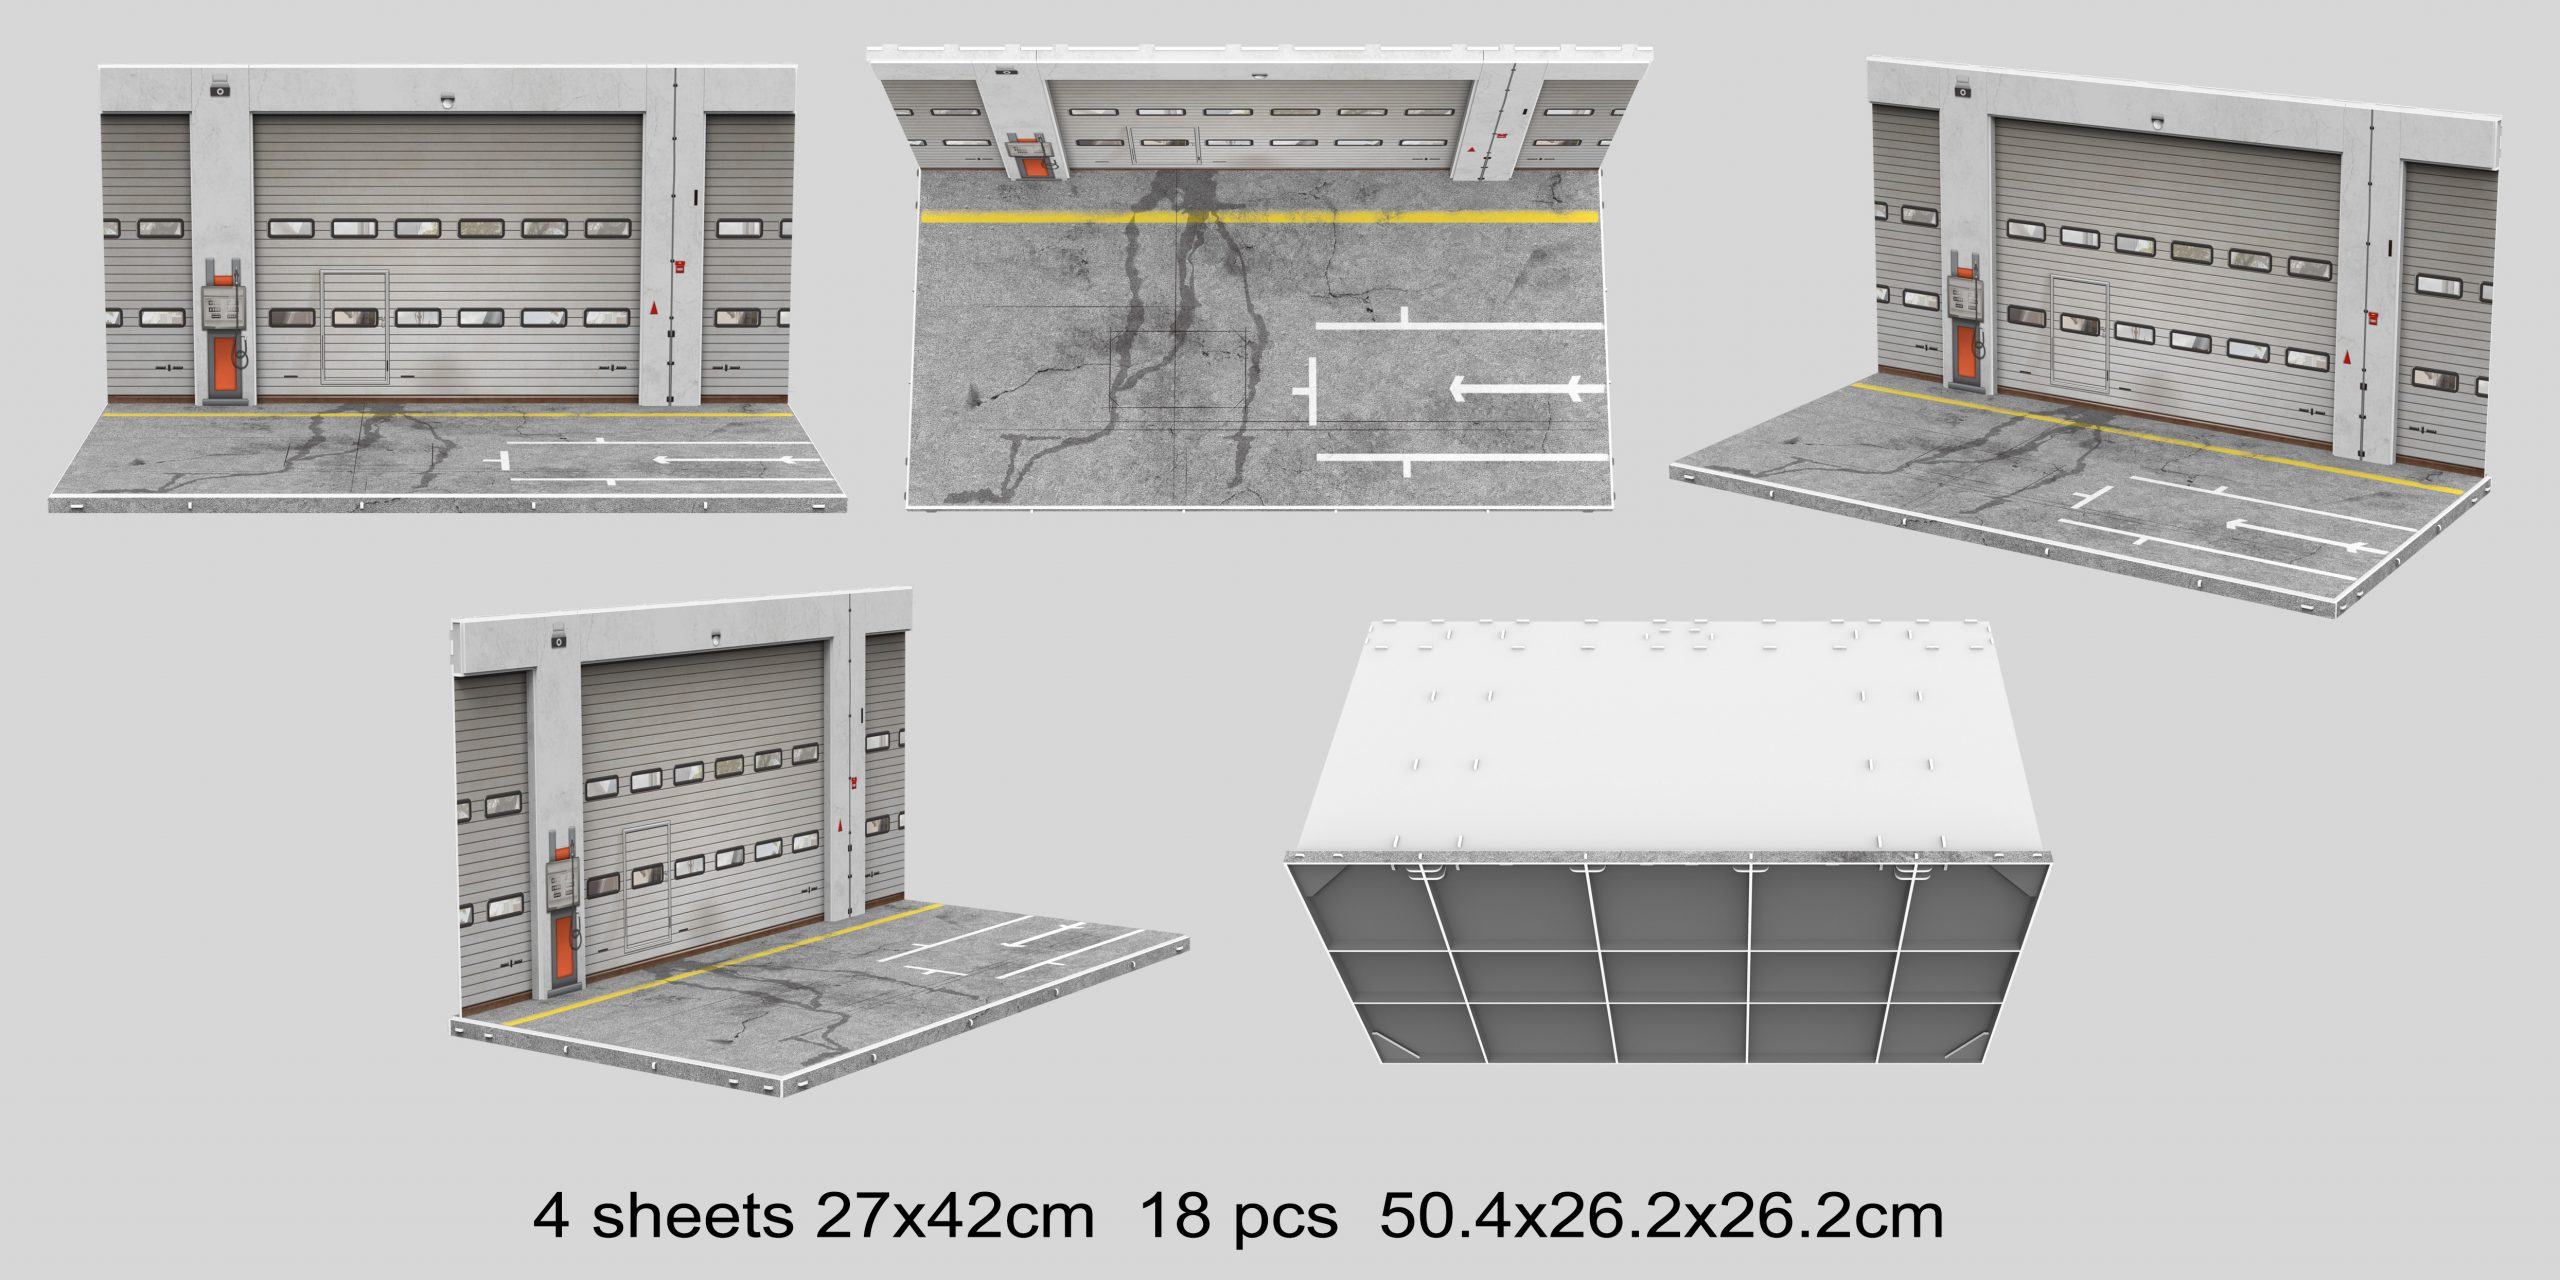 1:18 Pitbox diorama - Foto achtergrond